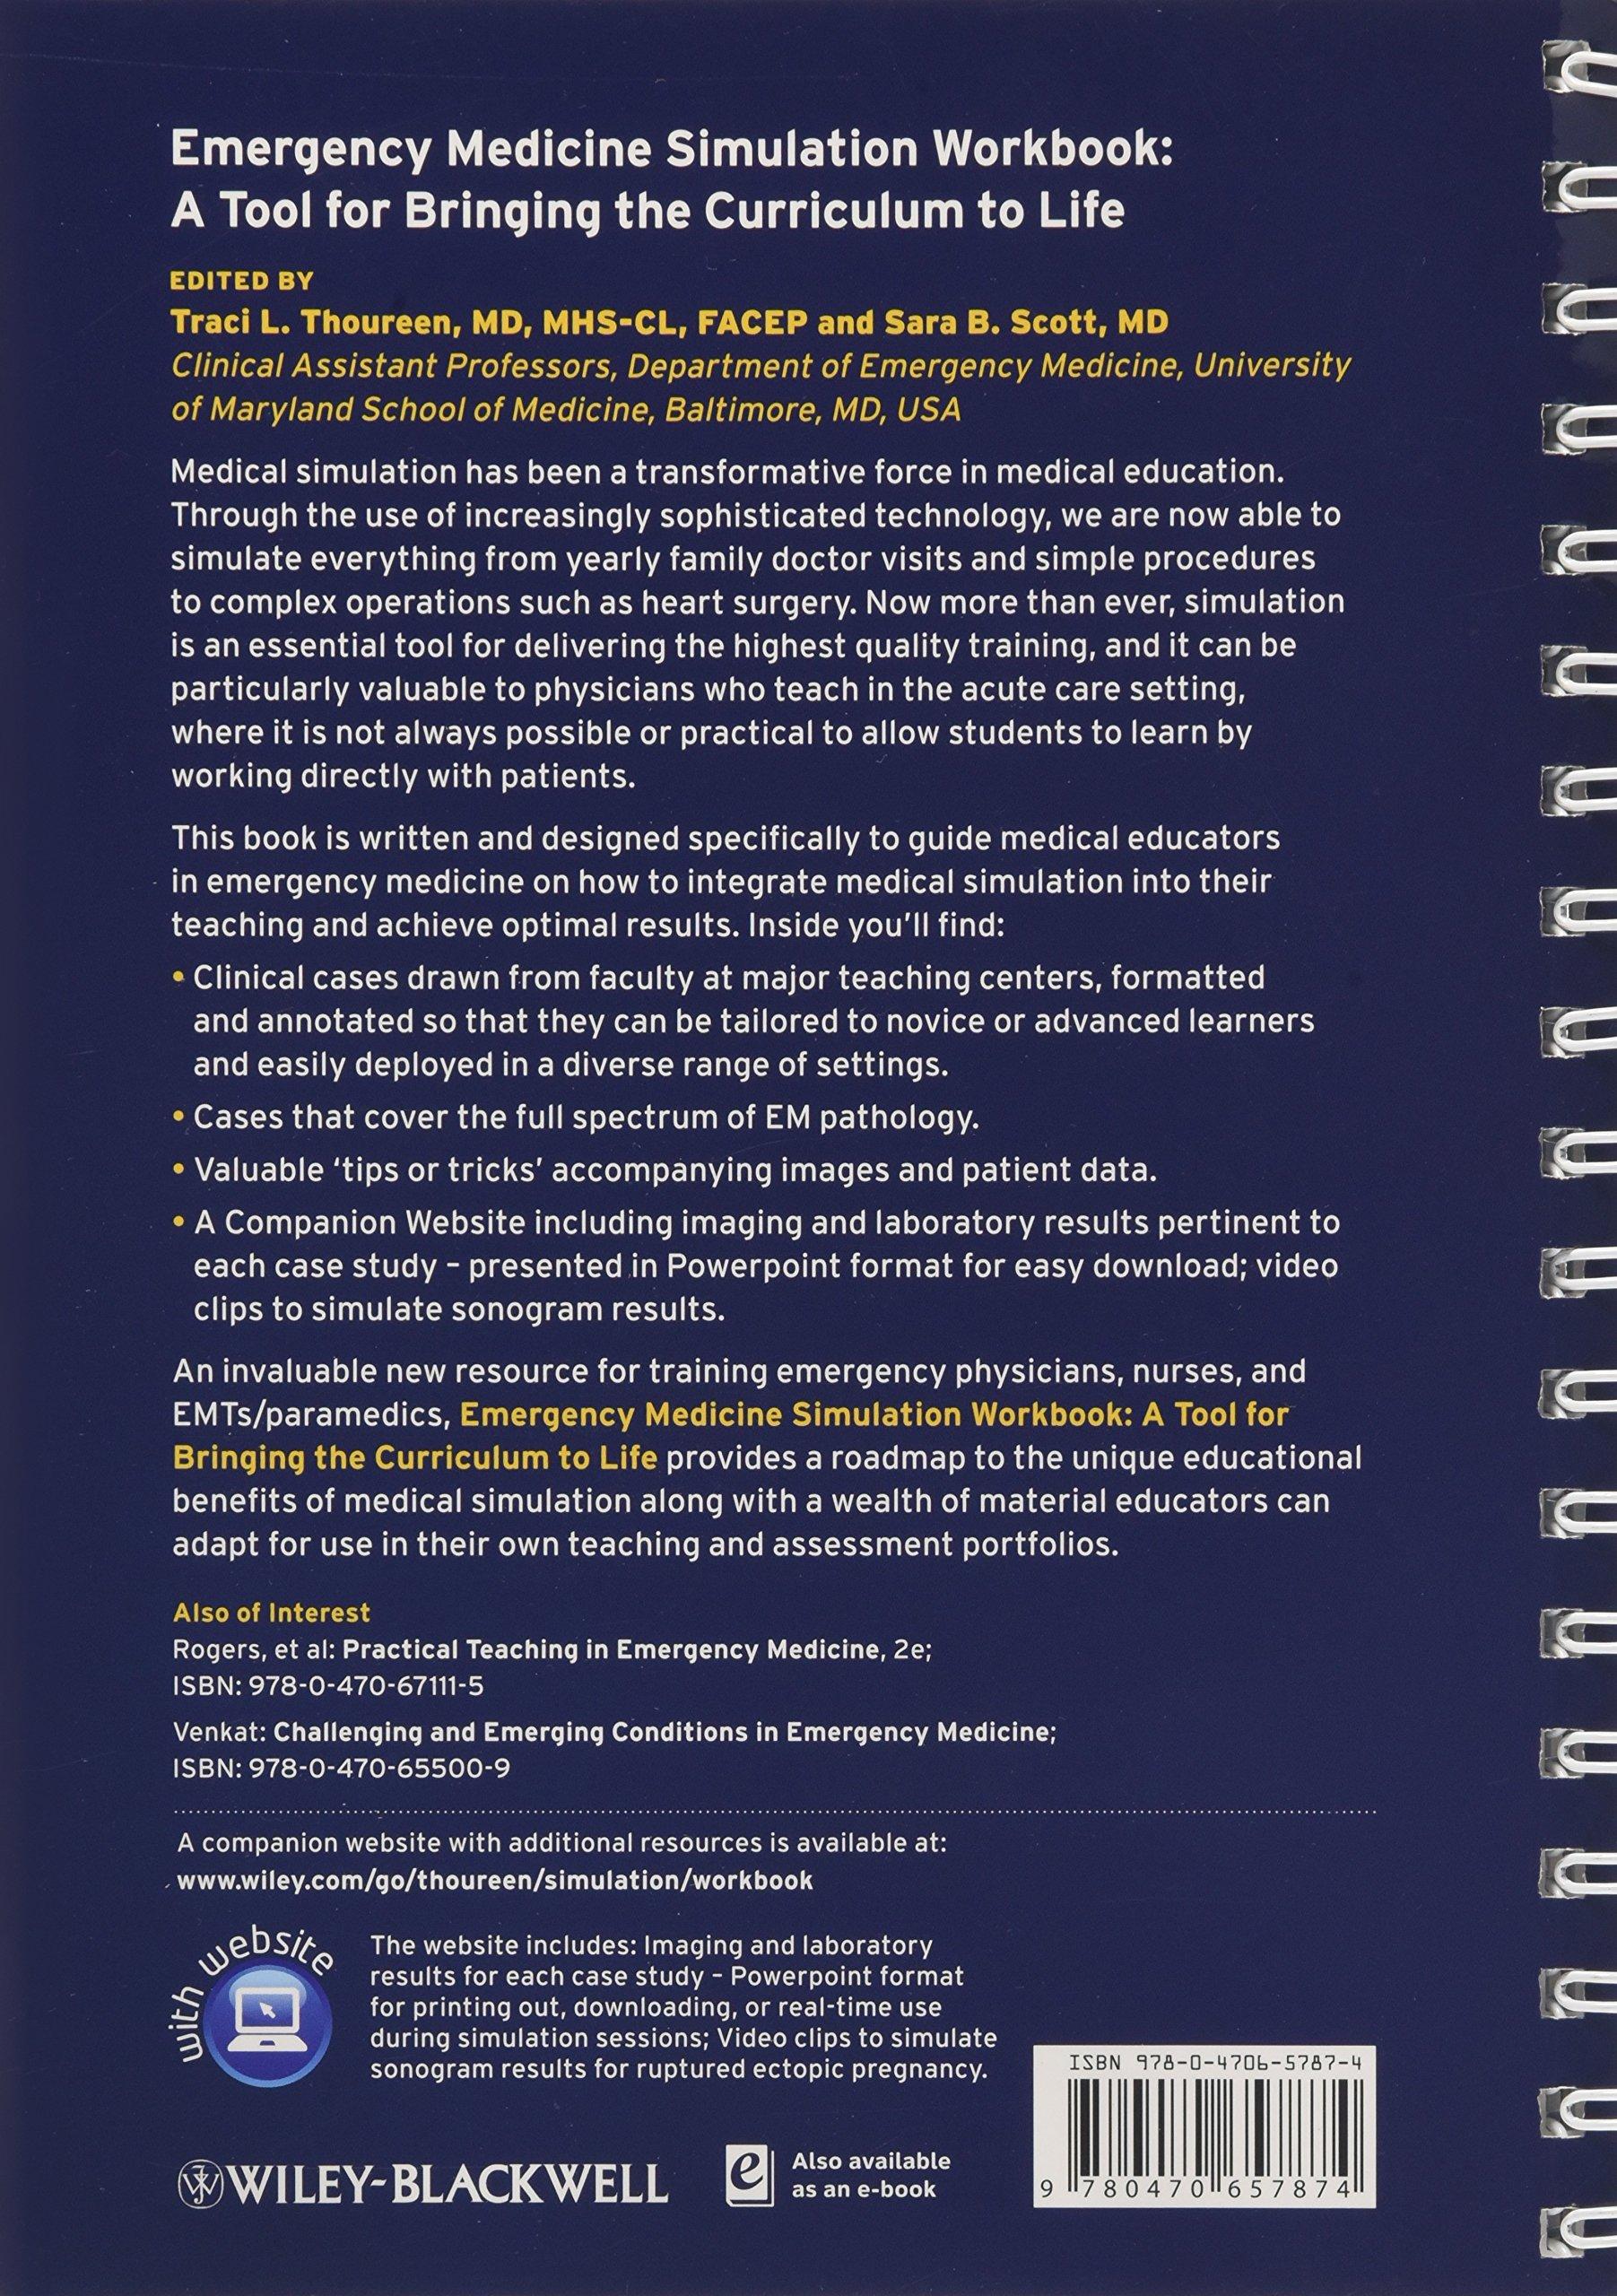 Emergency Medicine Simulation Workbook: A Tool for Bringing